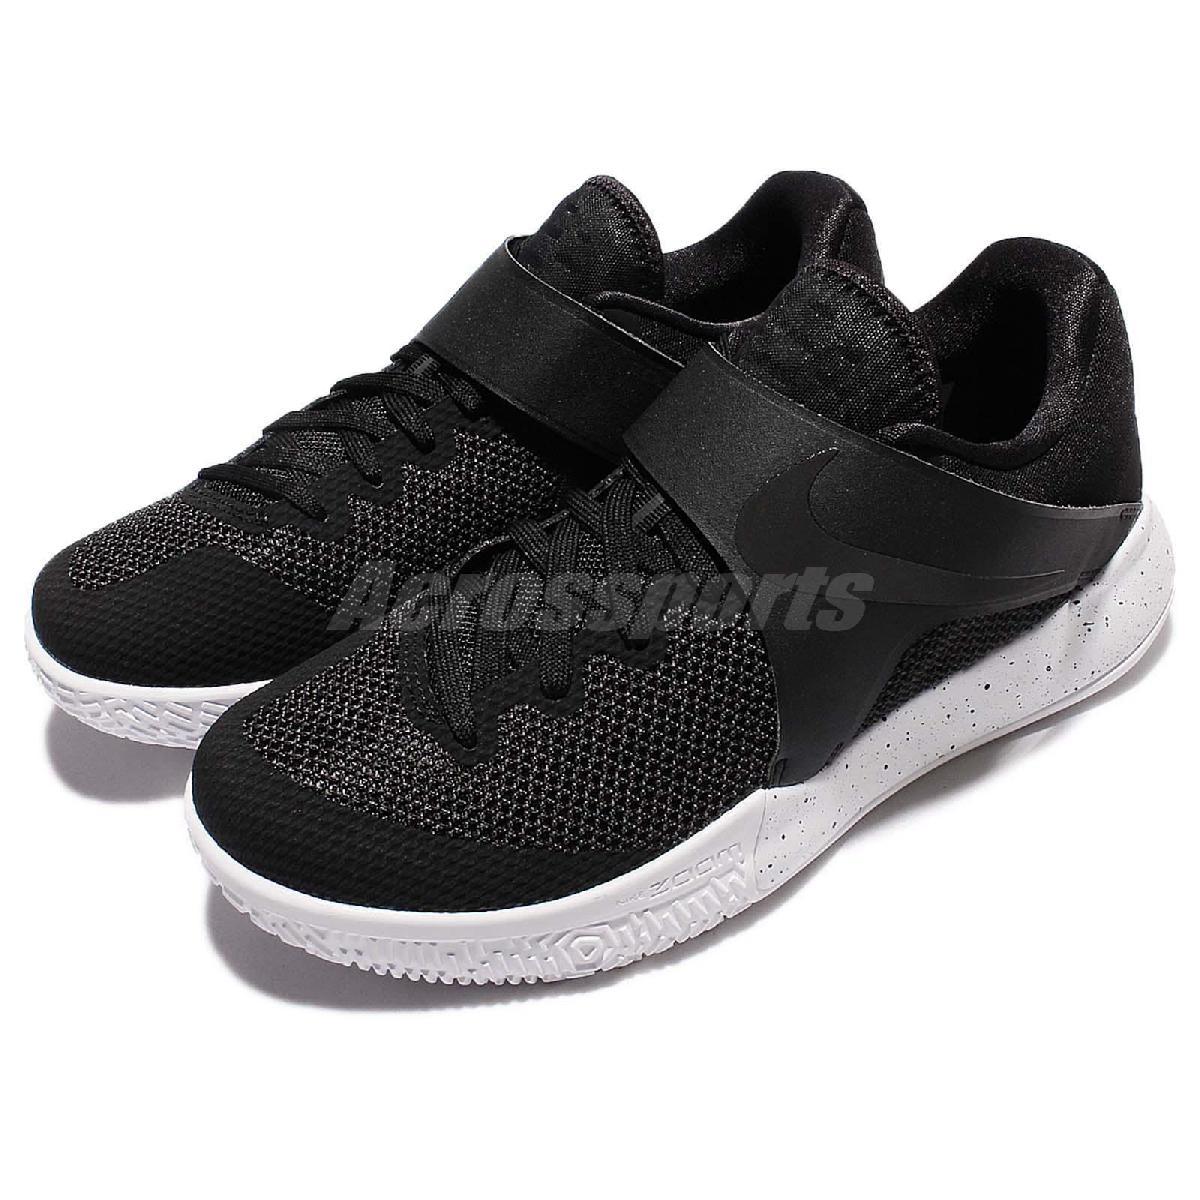 Nike籃球鞋Zoom Live EP黑白潑墨魔鬼氈低筒運動鞋男鞋球鞋PUMP306 860633-001